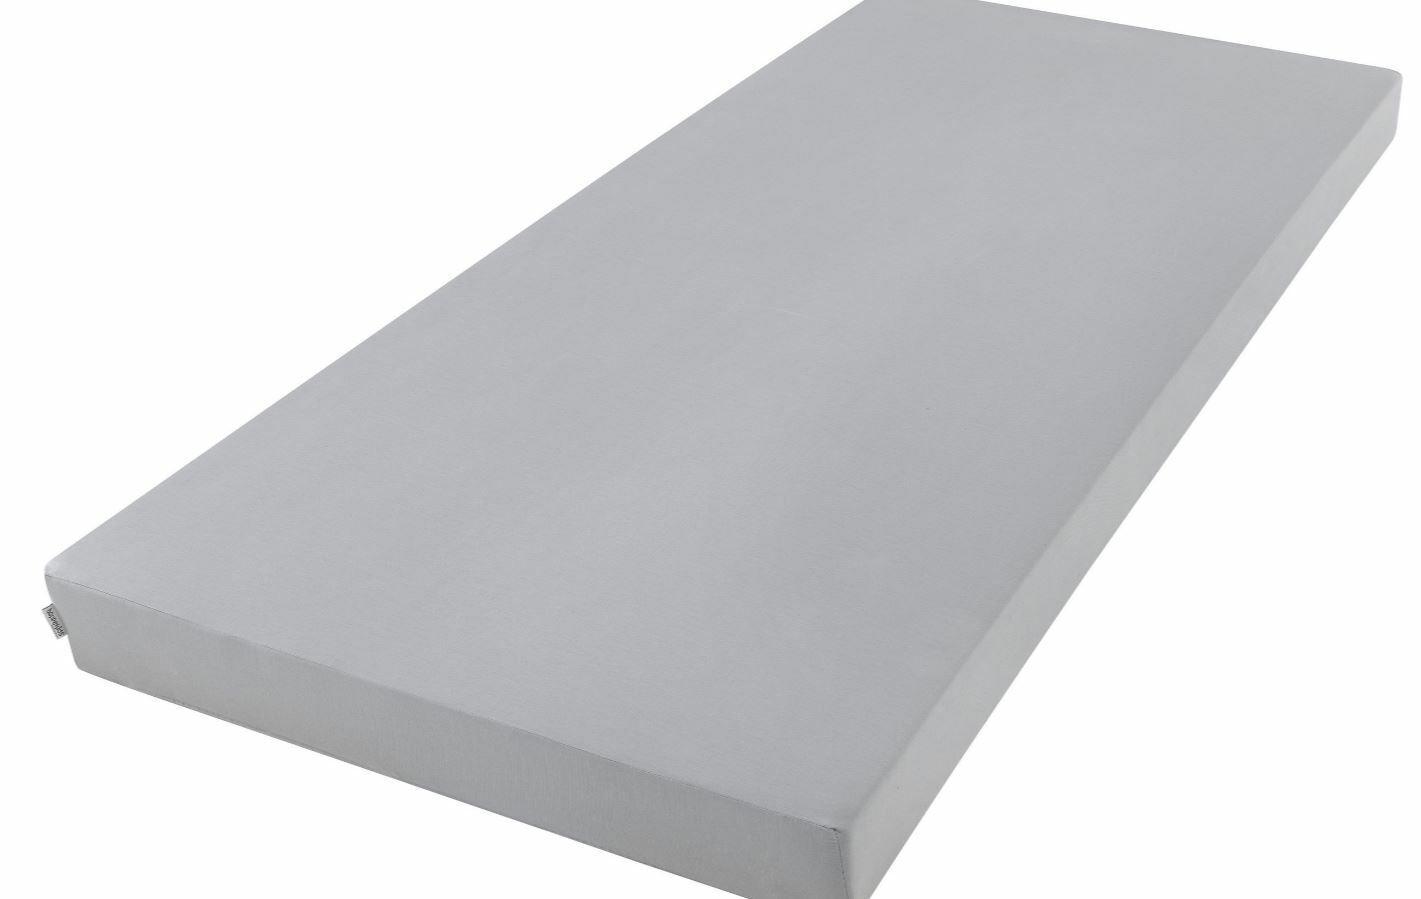 Matratze mit Bezug Hoppekids grau 70 x 190 x 9 cm  819956